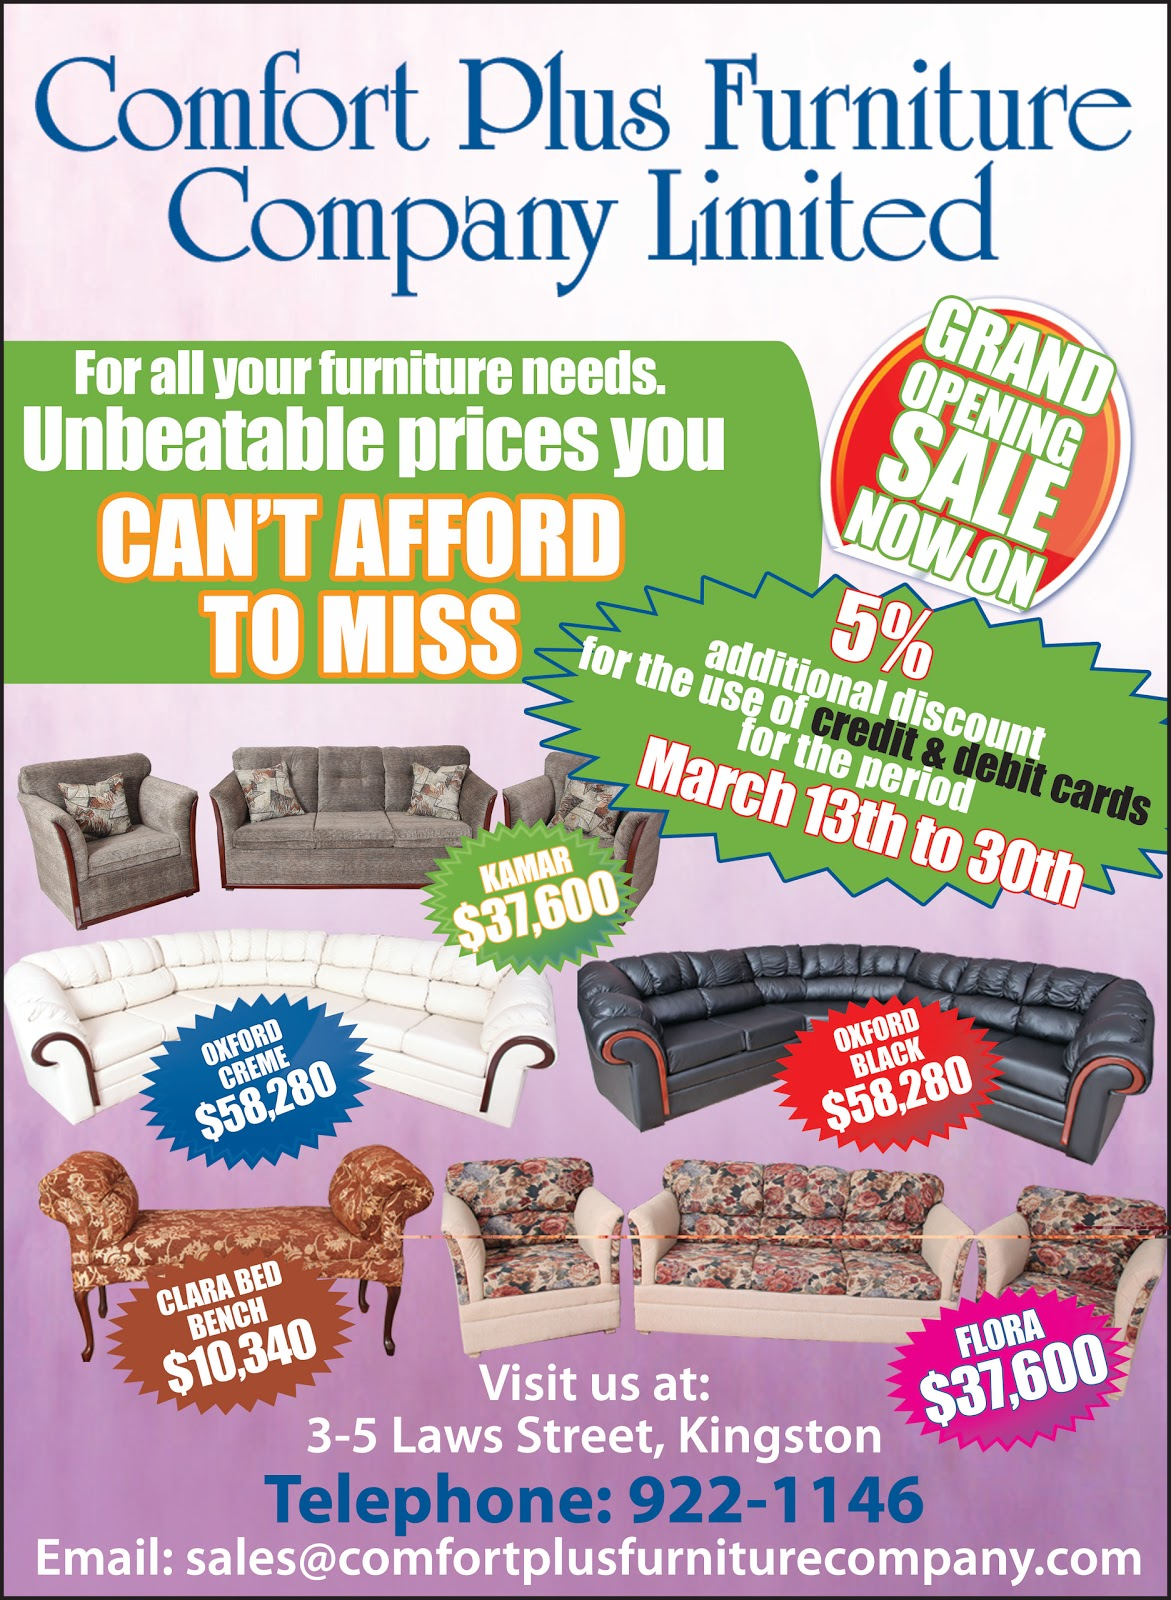 Superb Profile:Comfort Plus Furniture Company